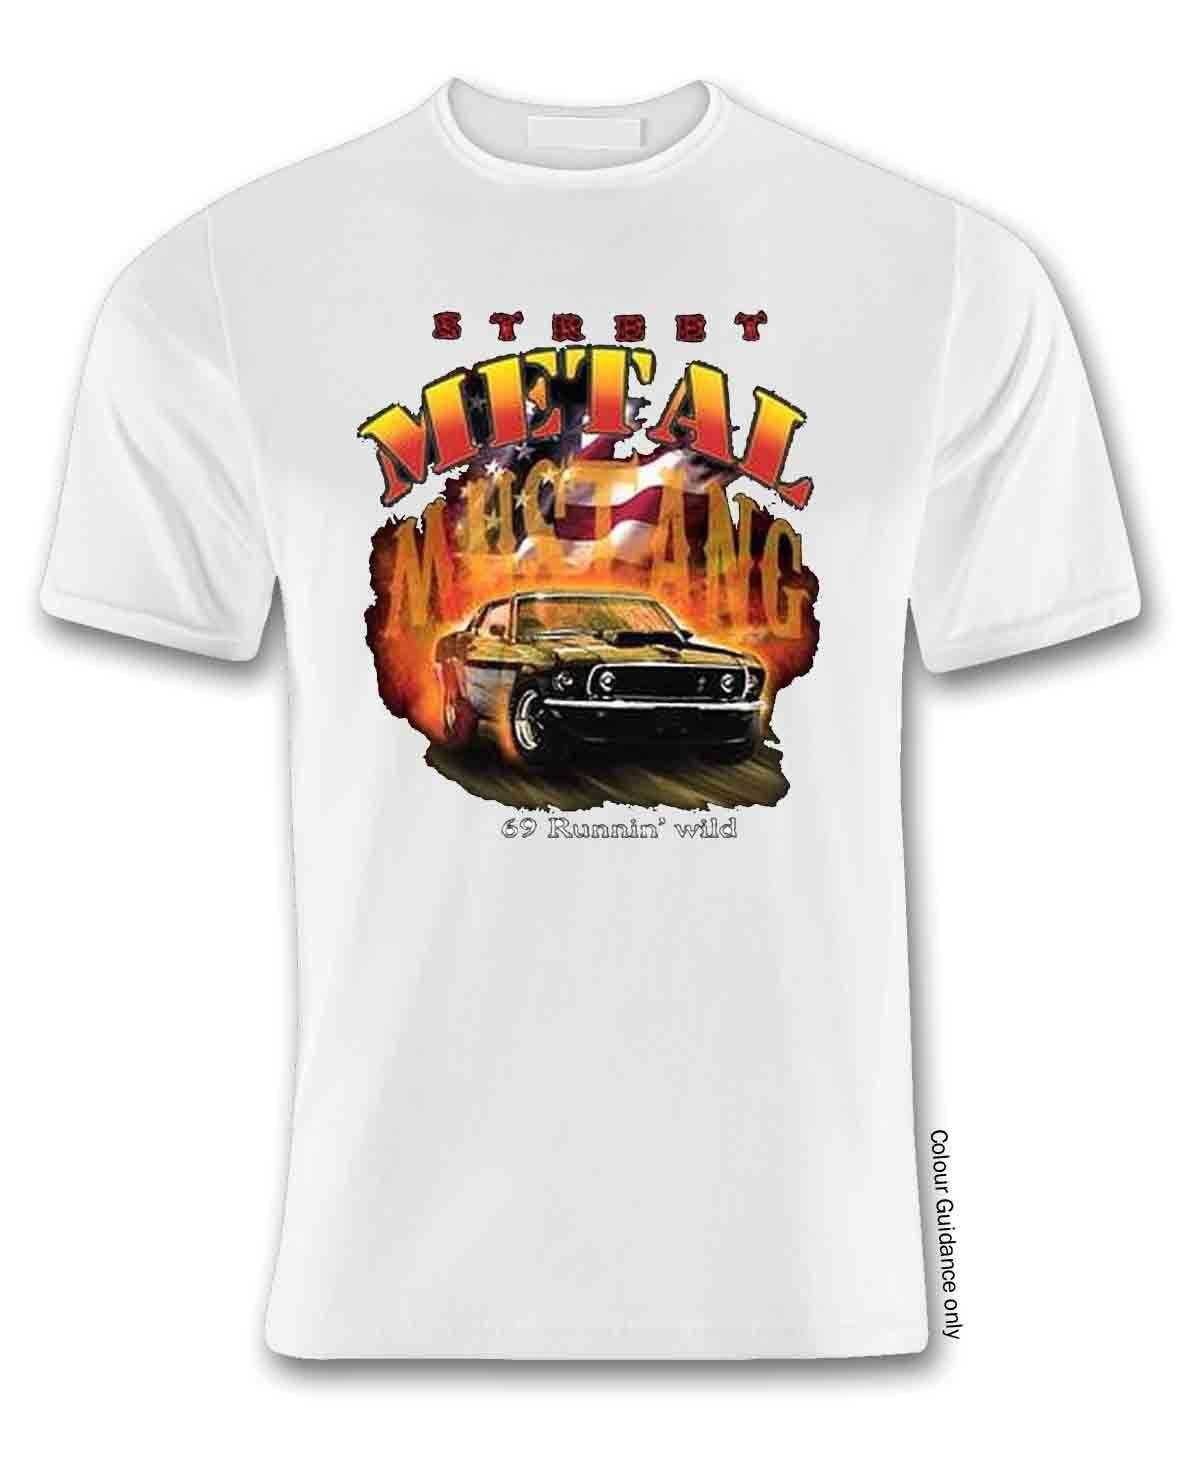 Ford streat metal white t shirt